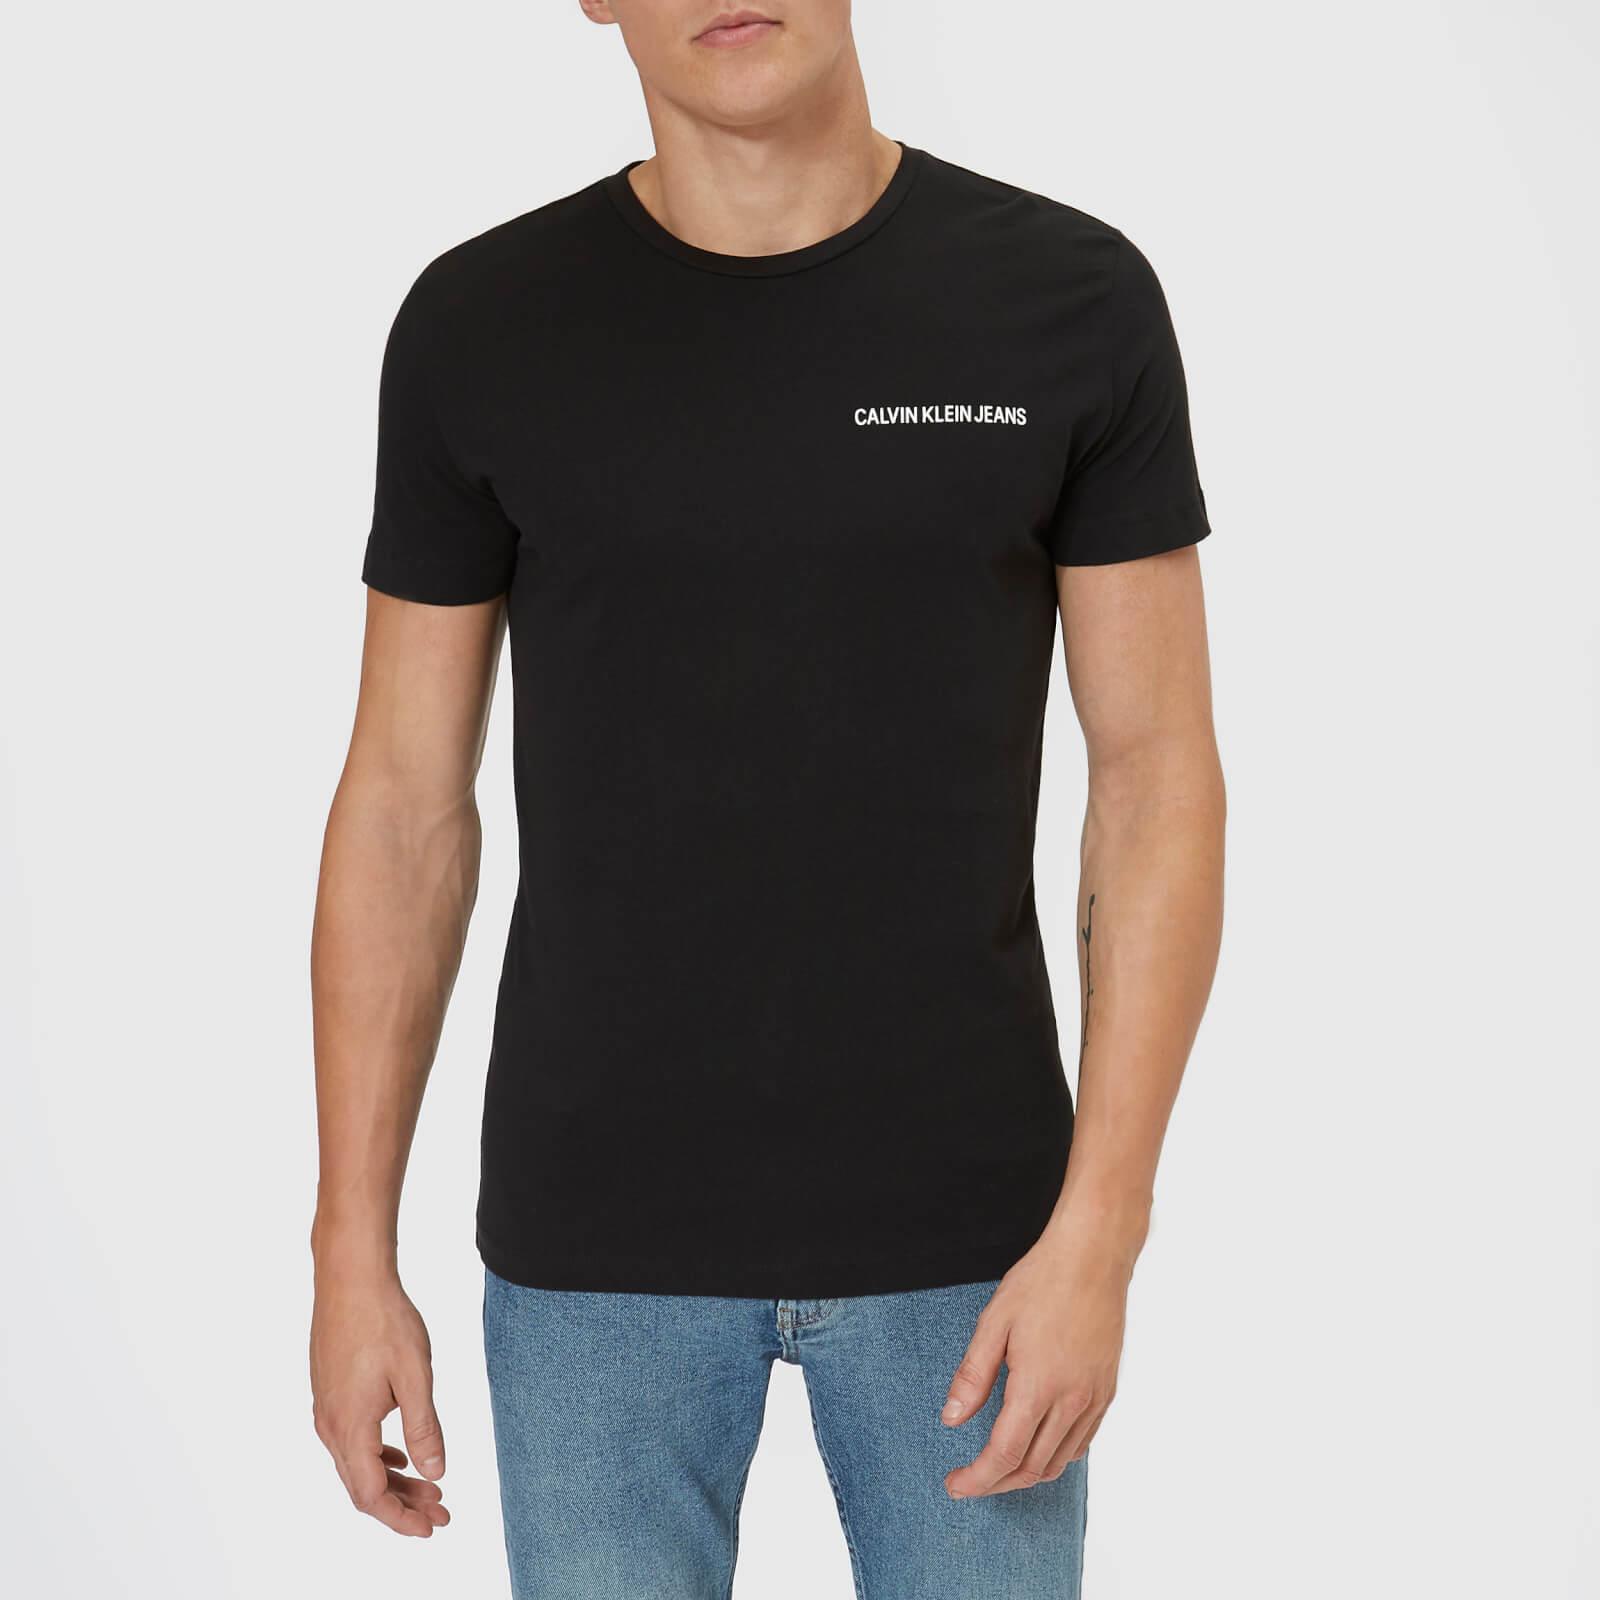 d903150103ed Calvin Klein Jeans Men's Chest Institutional Slim T-Shirt - CK Black  Clothing | TheHut.com